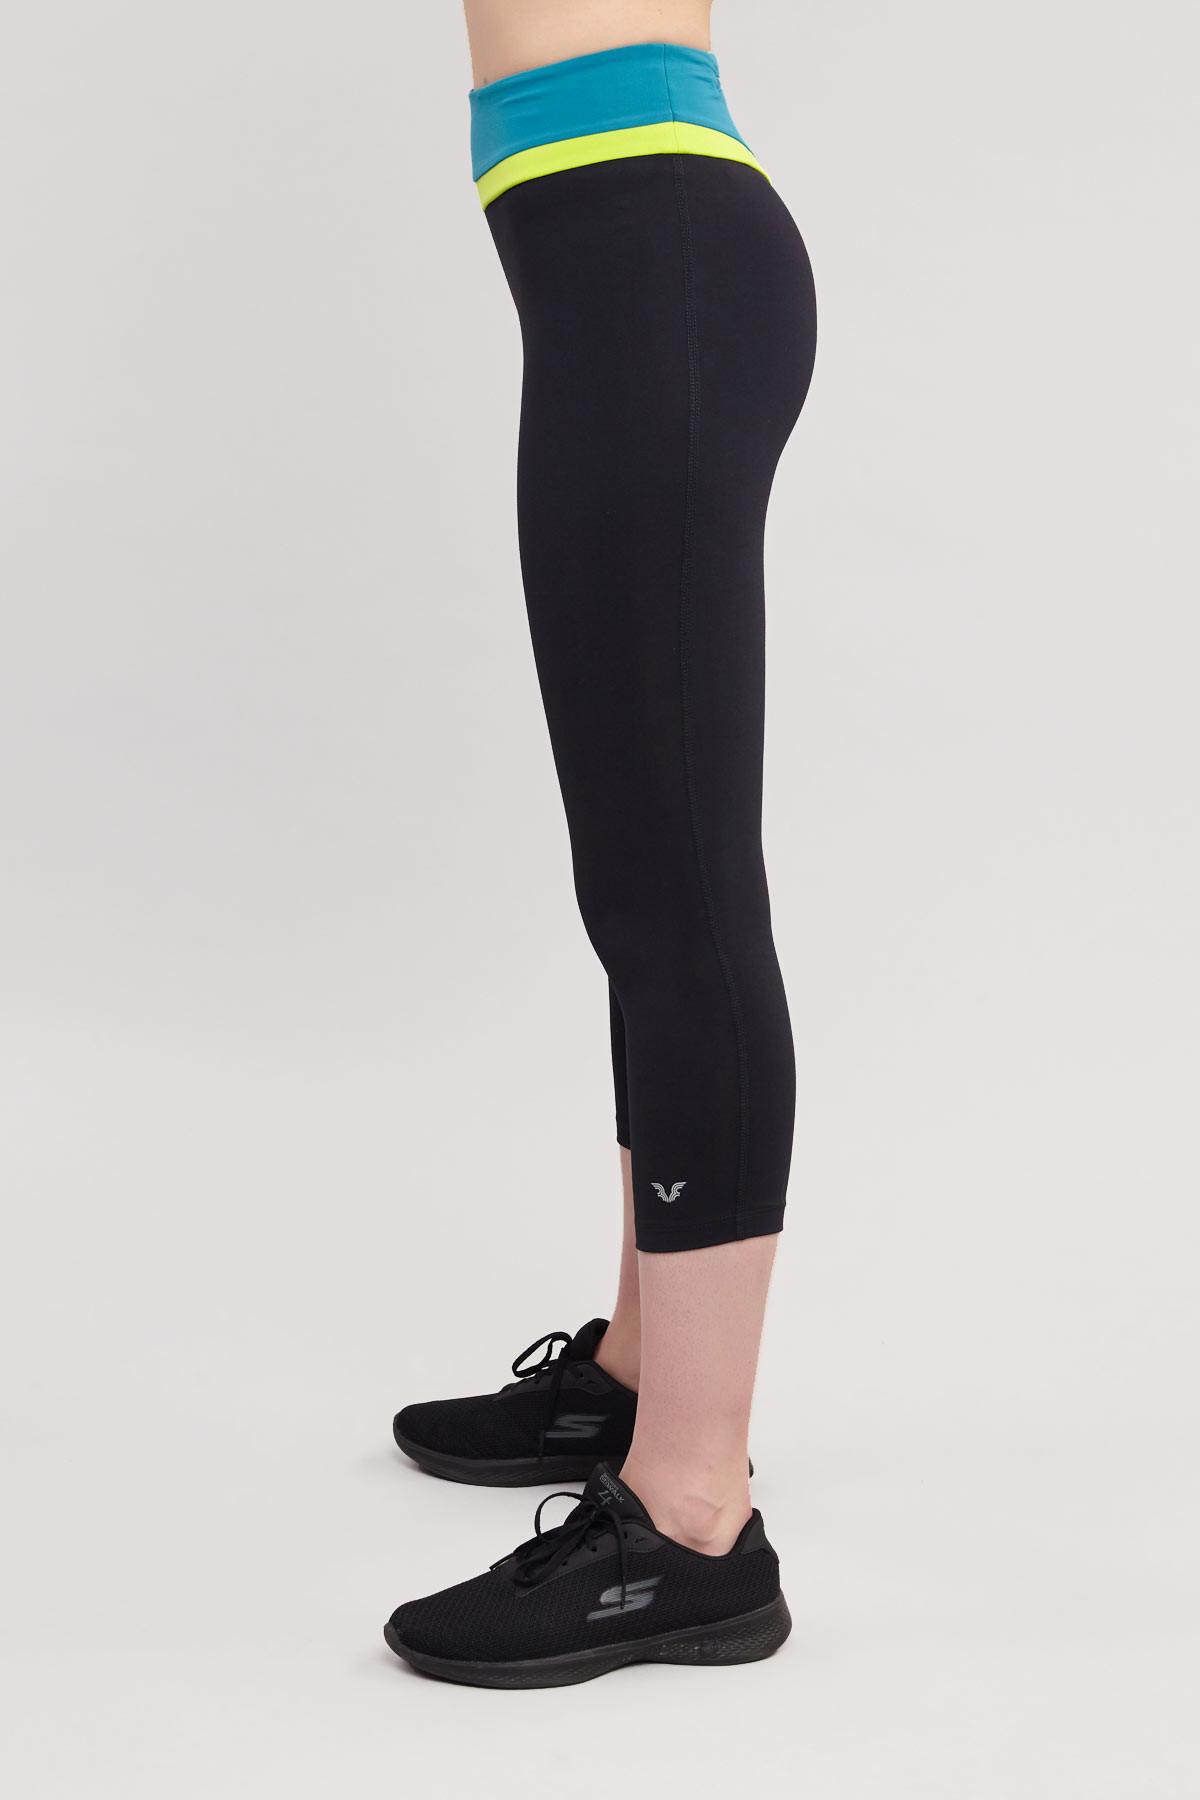 Bilcee Kadın 3/4 Kısa Sporcu Taytı BS-7118 BİLCEE